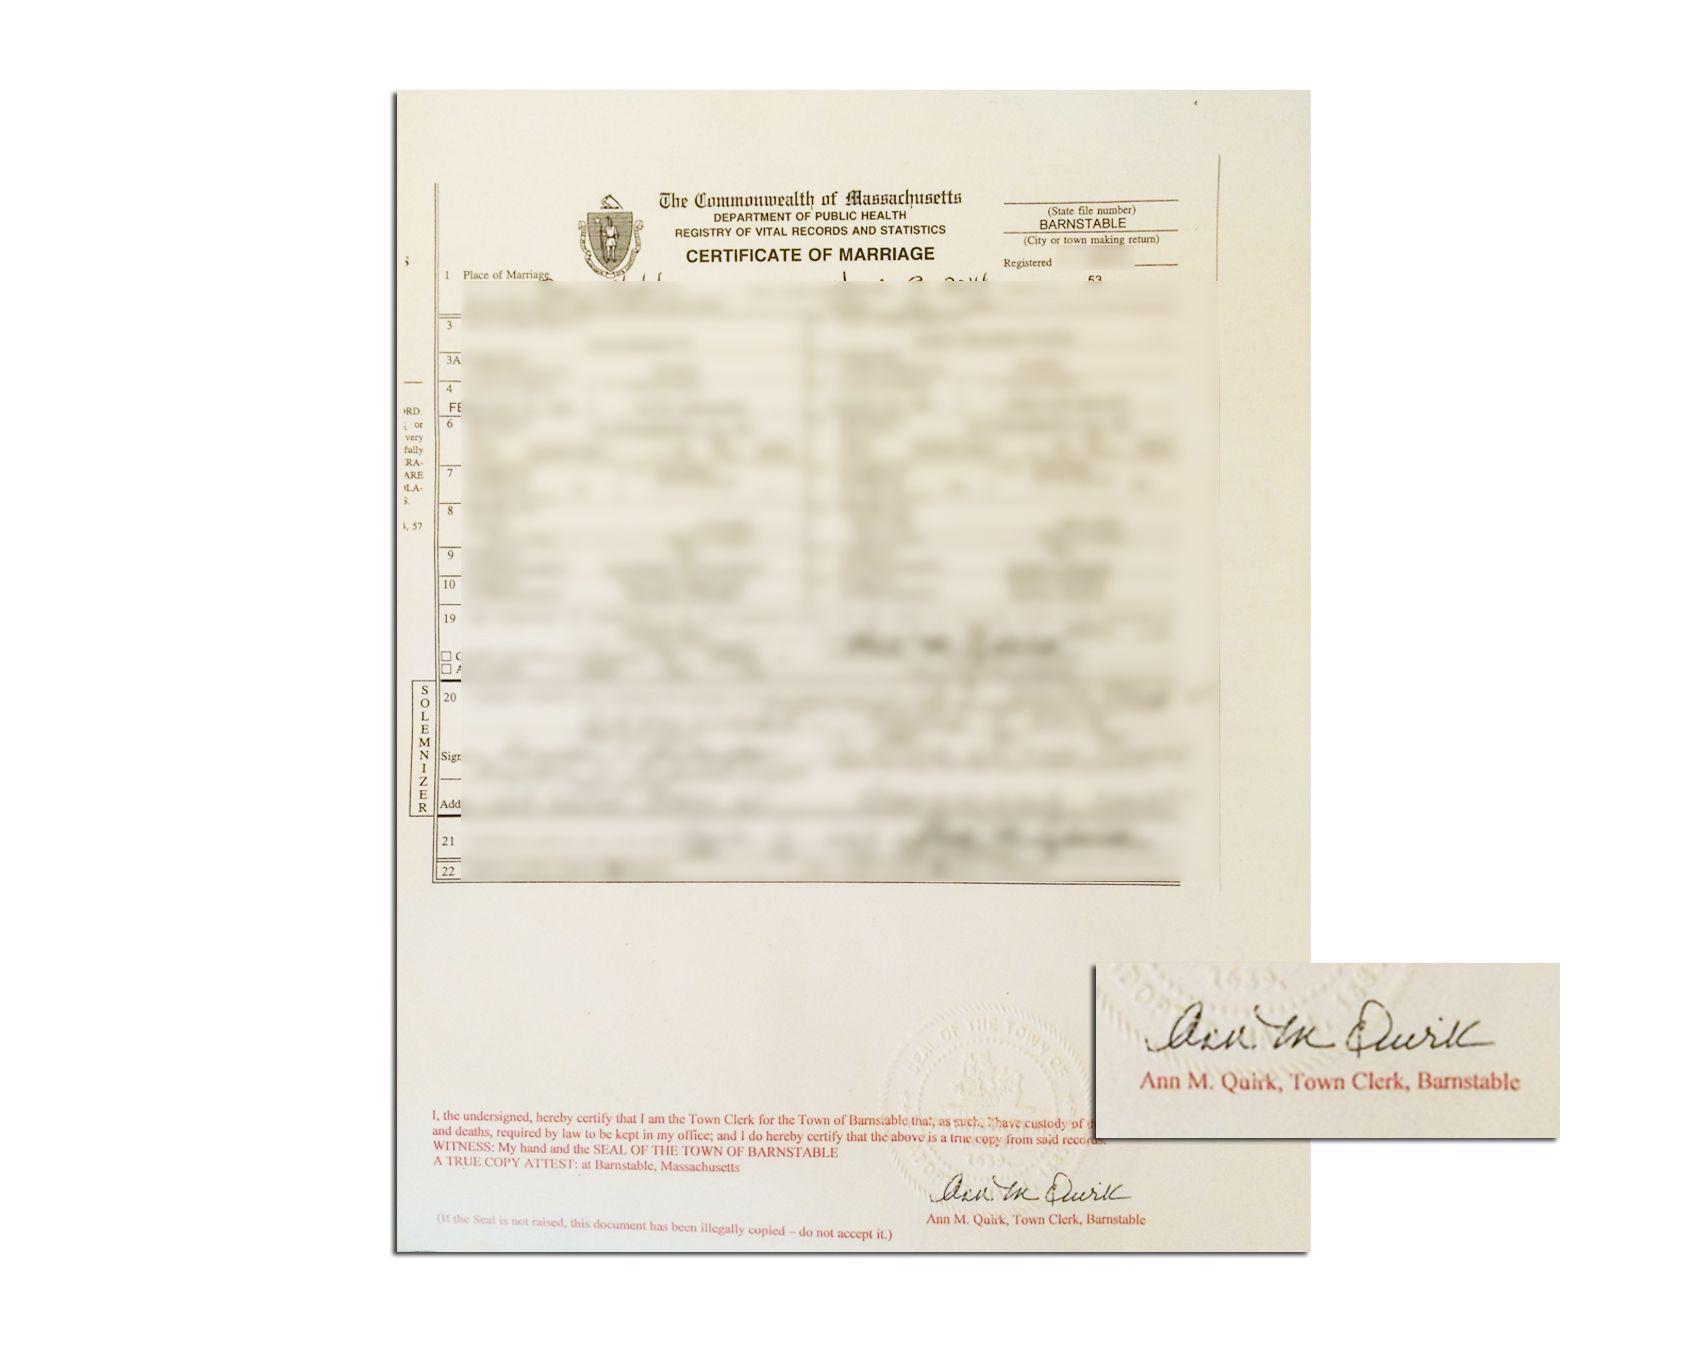 City of boston commonwealth of massachusetts certificate of city of boston commonwealth of massachusetts certificate of marriage issued by the city registrar state of massachusetts sample apostille pinterest aiddatafo Image collections